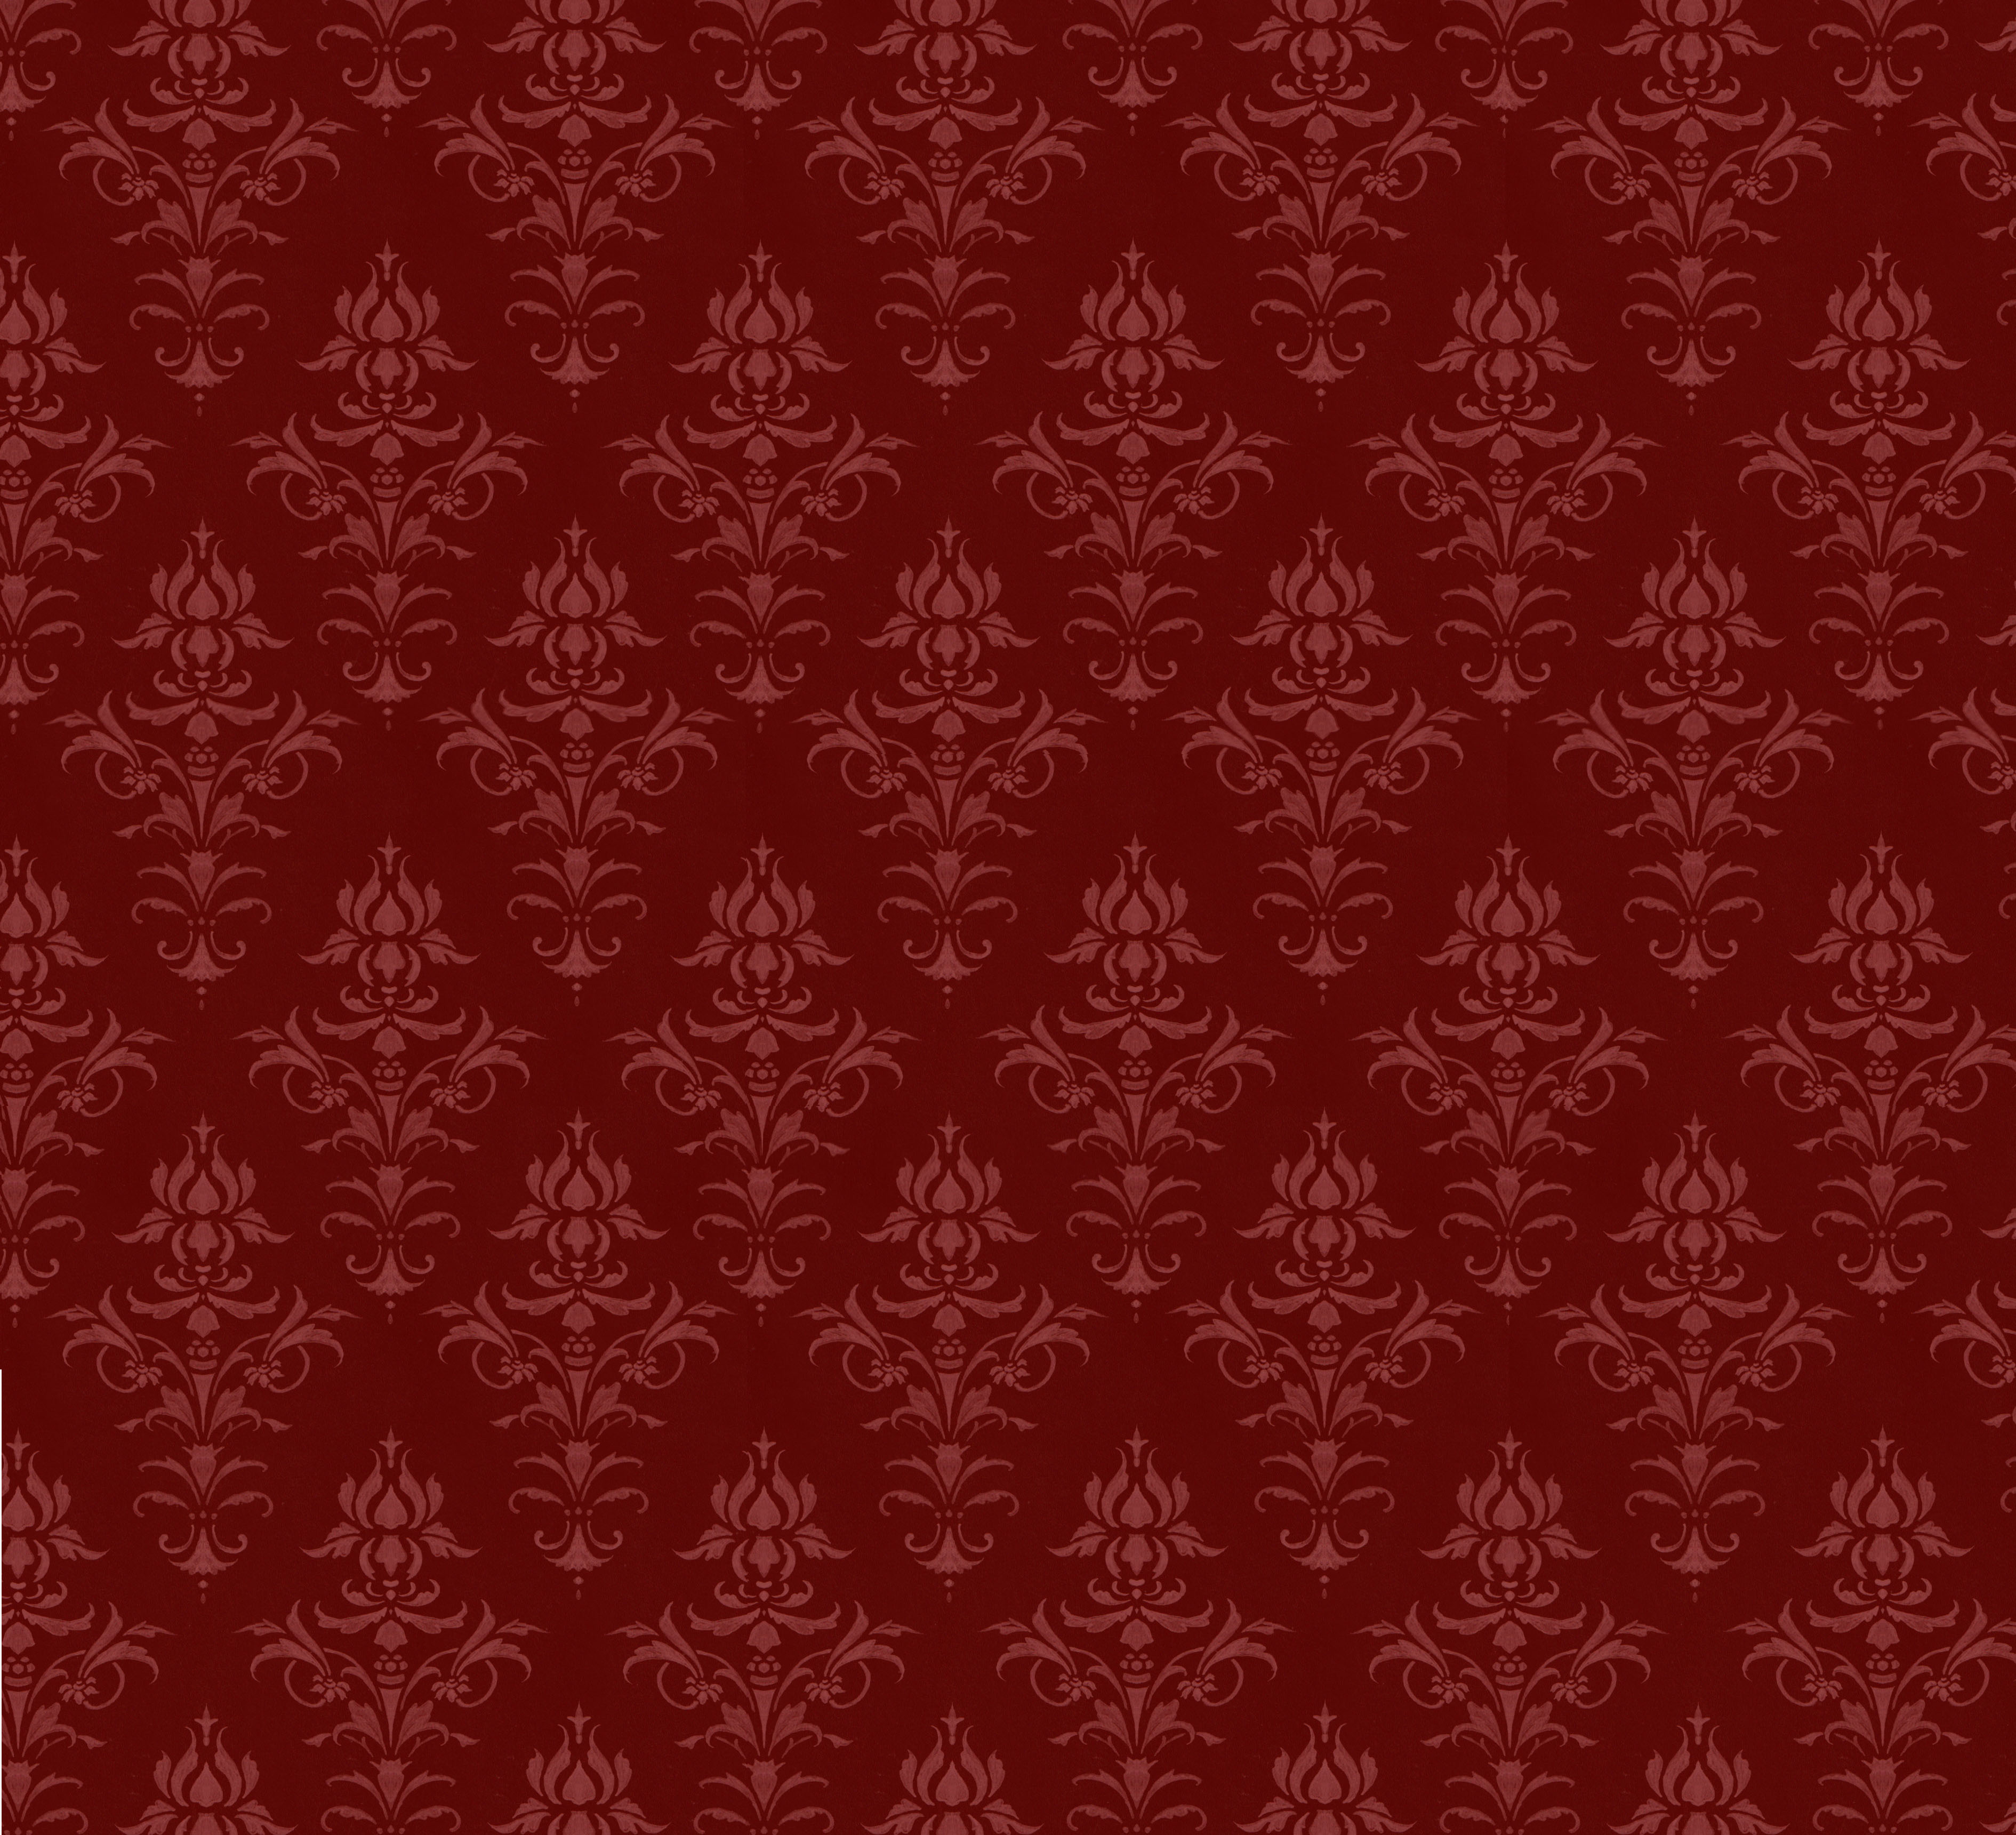 Victorian Desktop Wallpapers Victorian Wallpaper Patterns 3781x3441